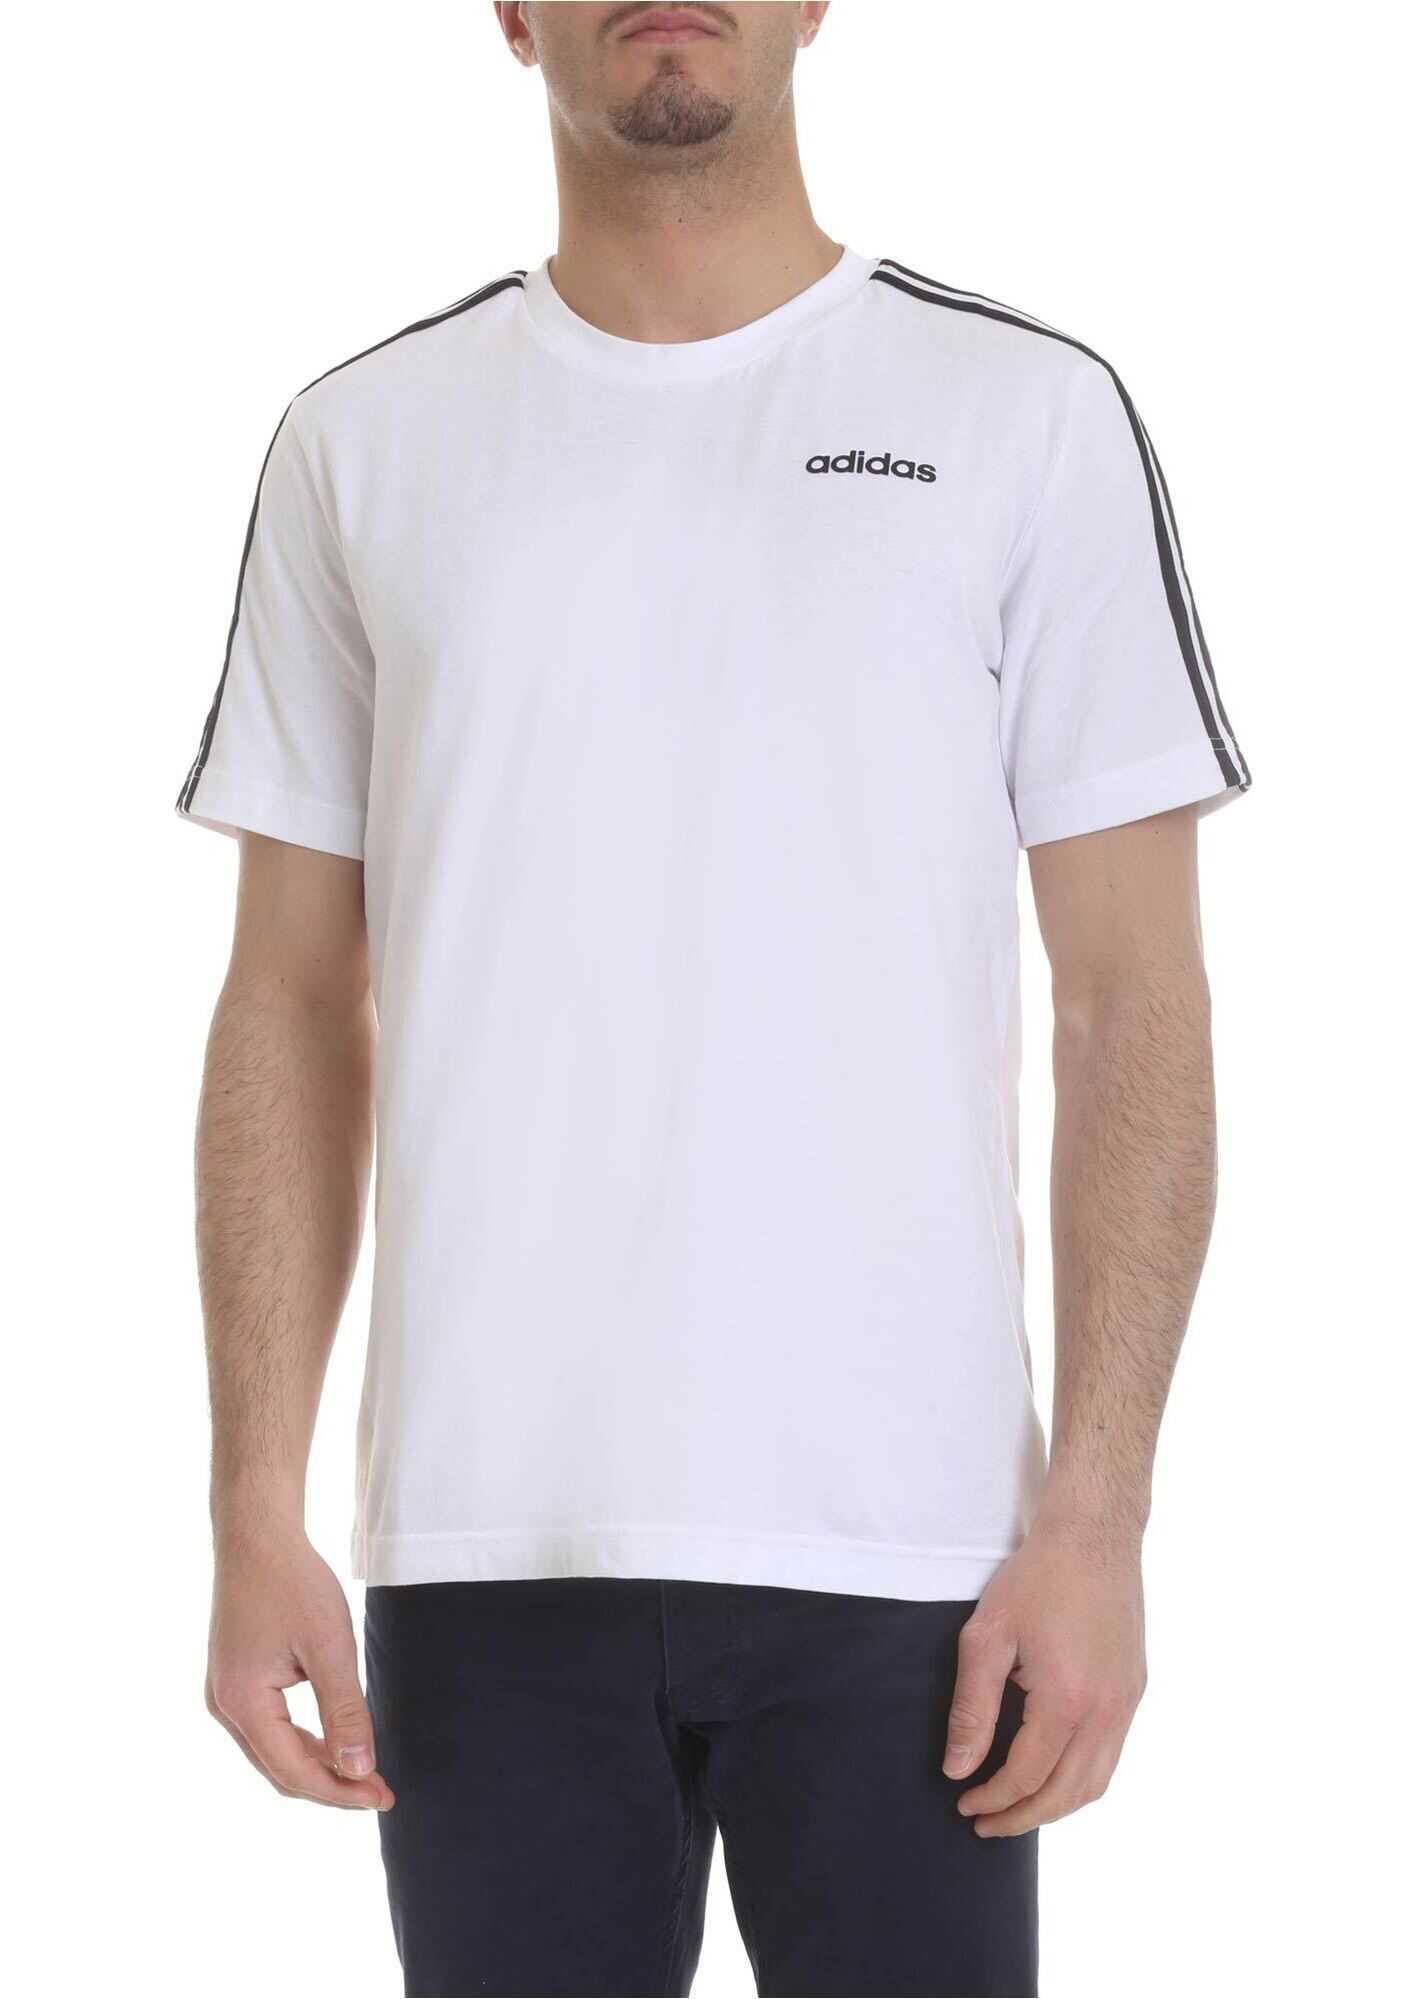 adidas Essetials-3 Stripes T-Shirt In White White